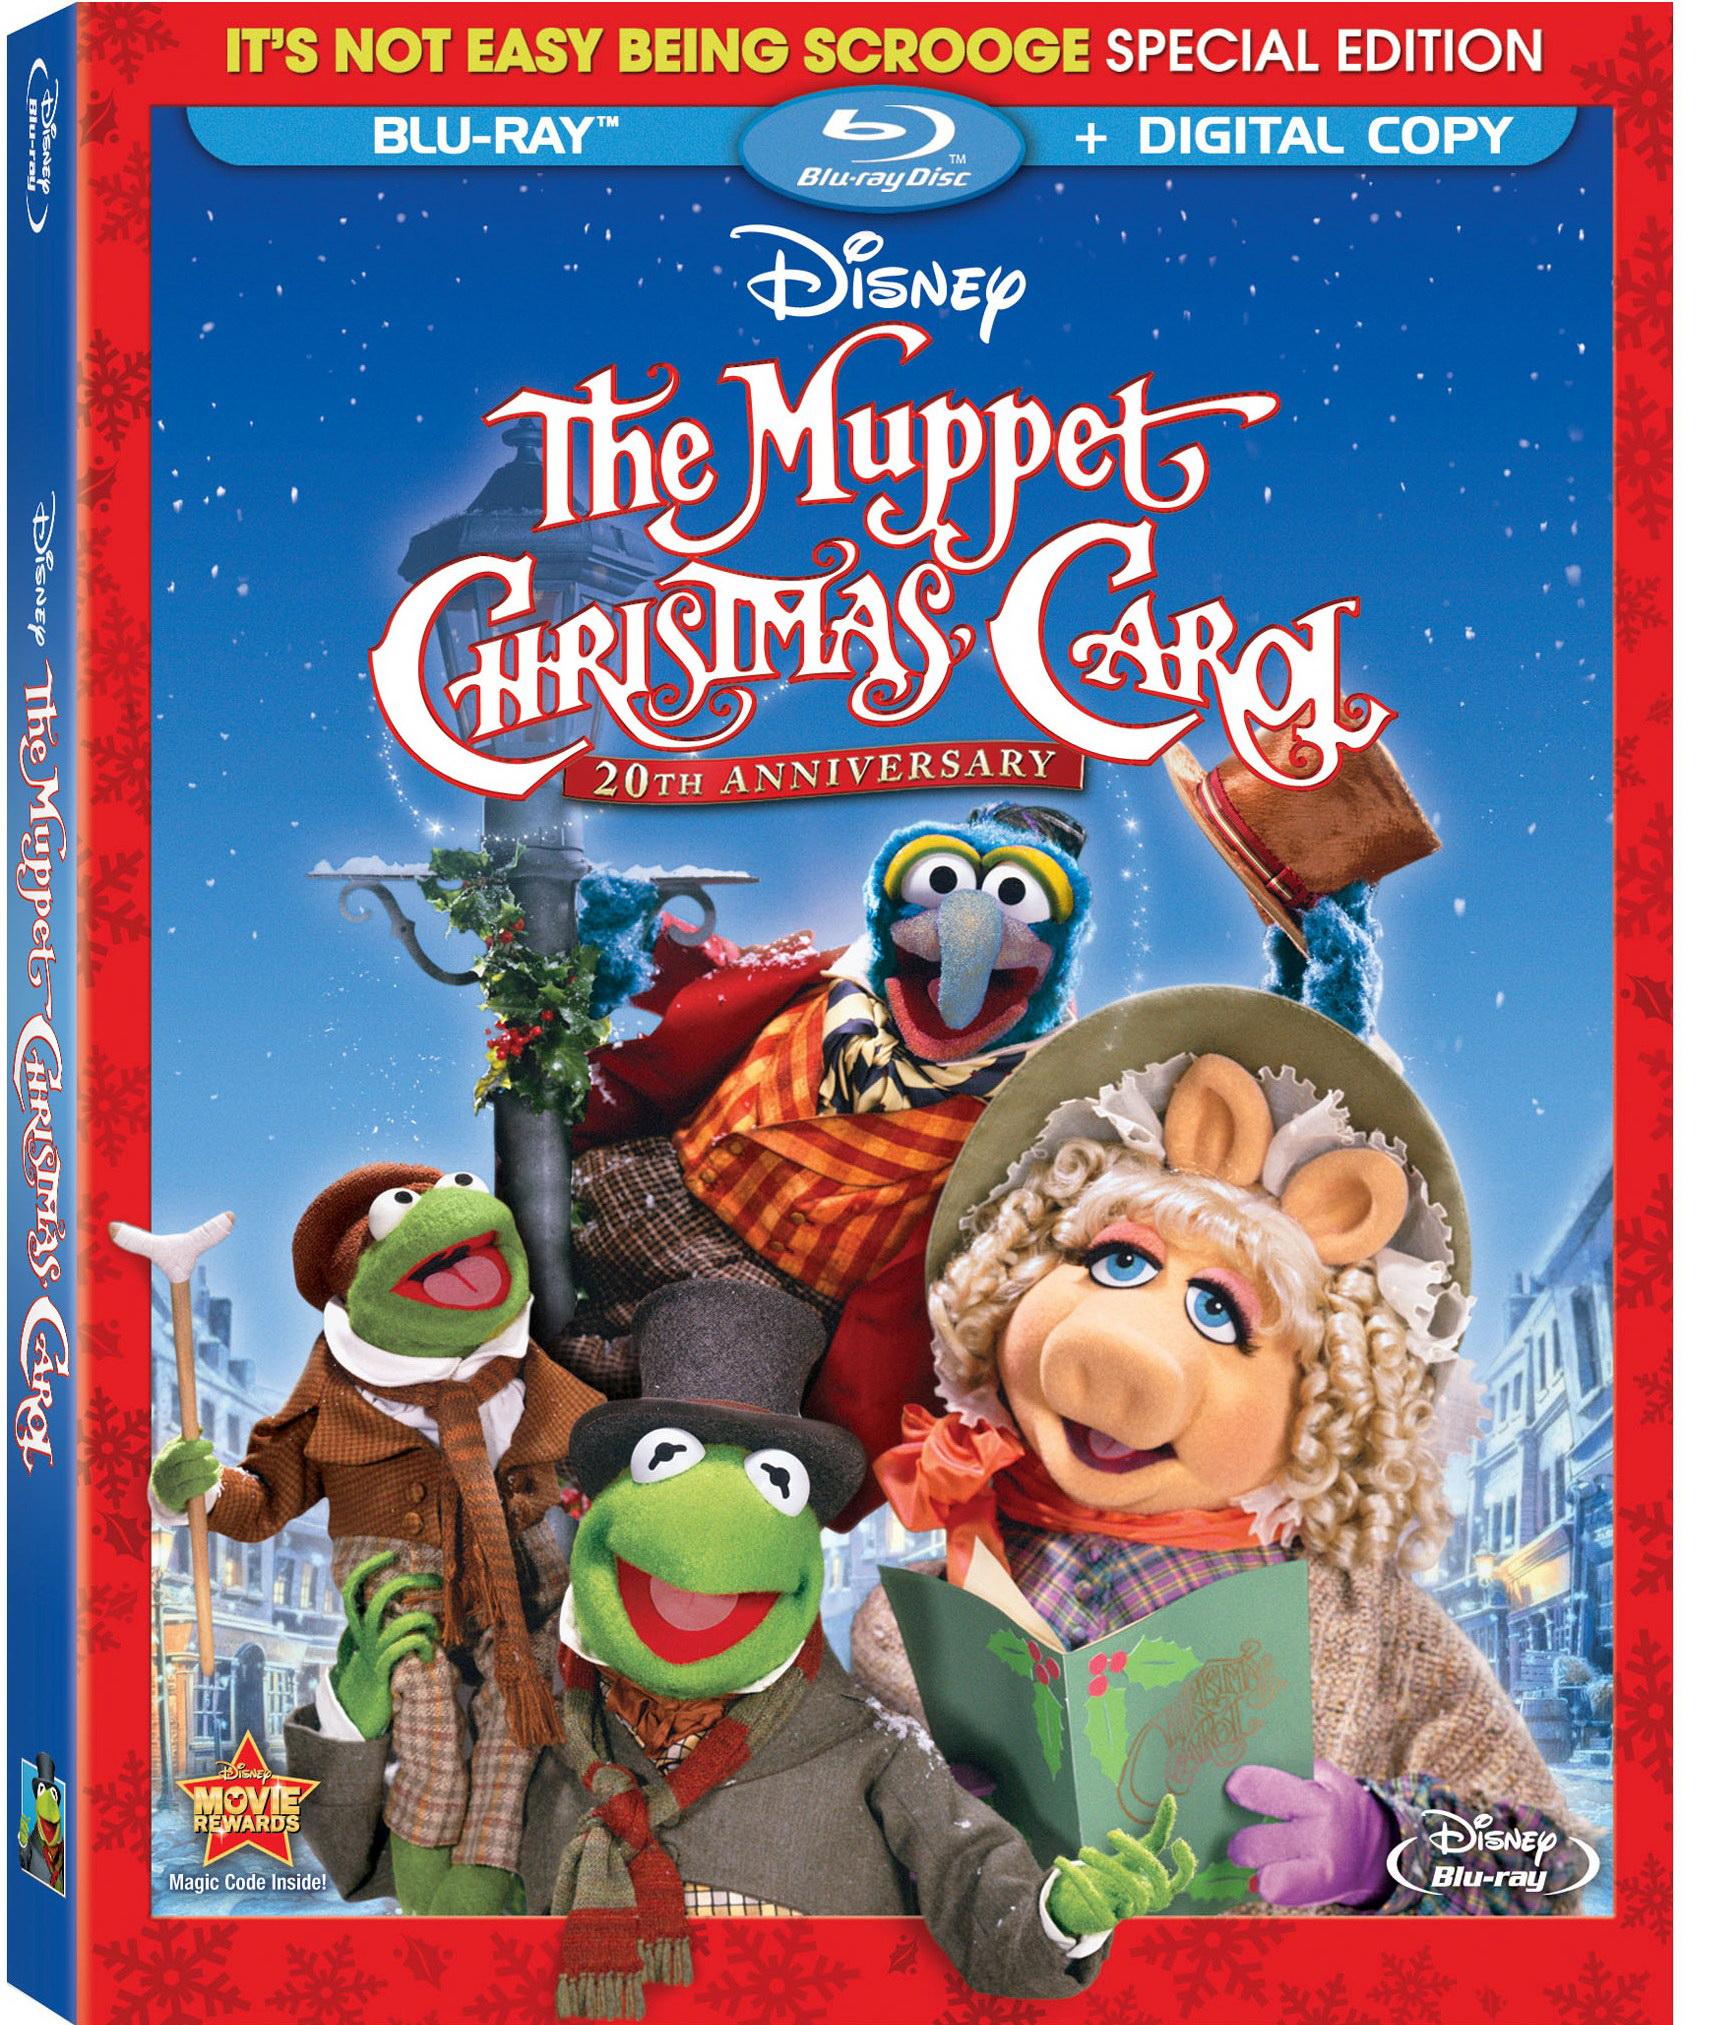 A Muppet Christmas Carol: The Muppet Christmas Carol (video)